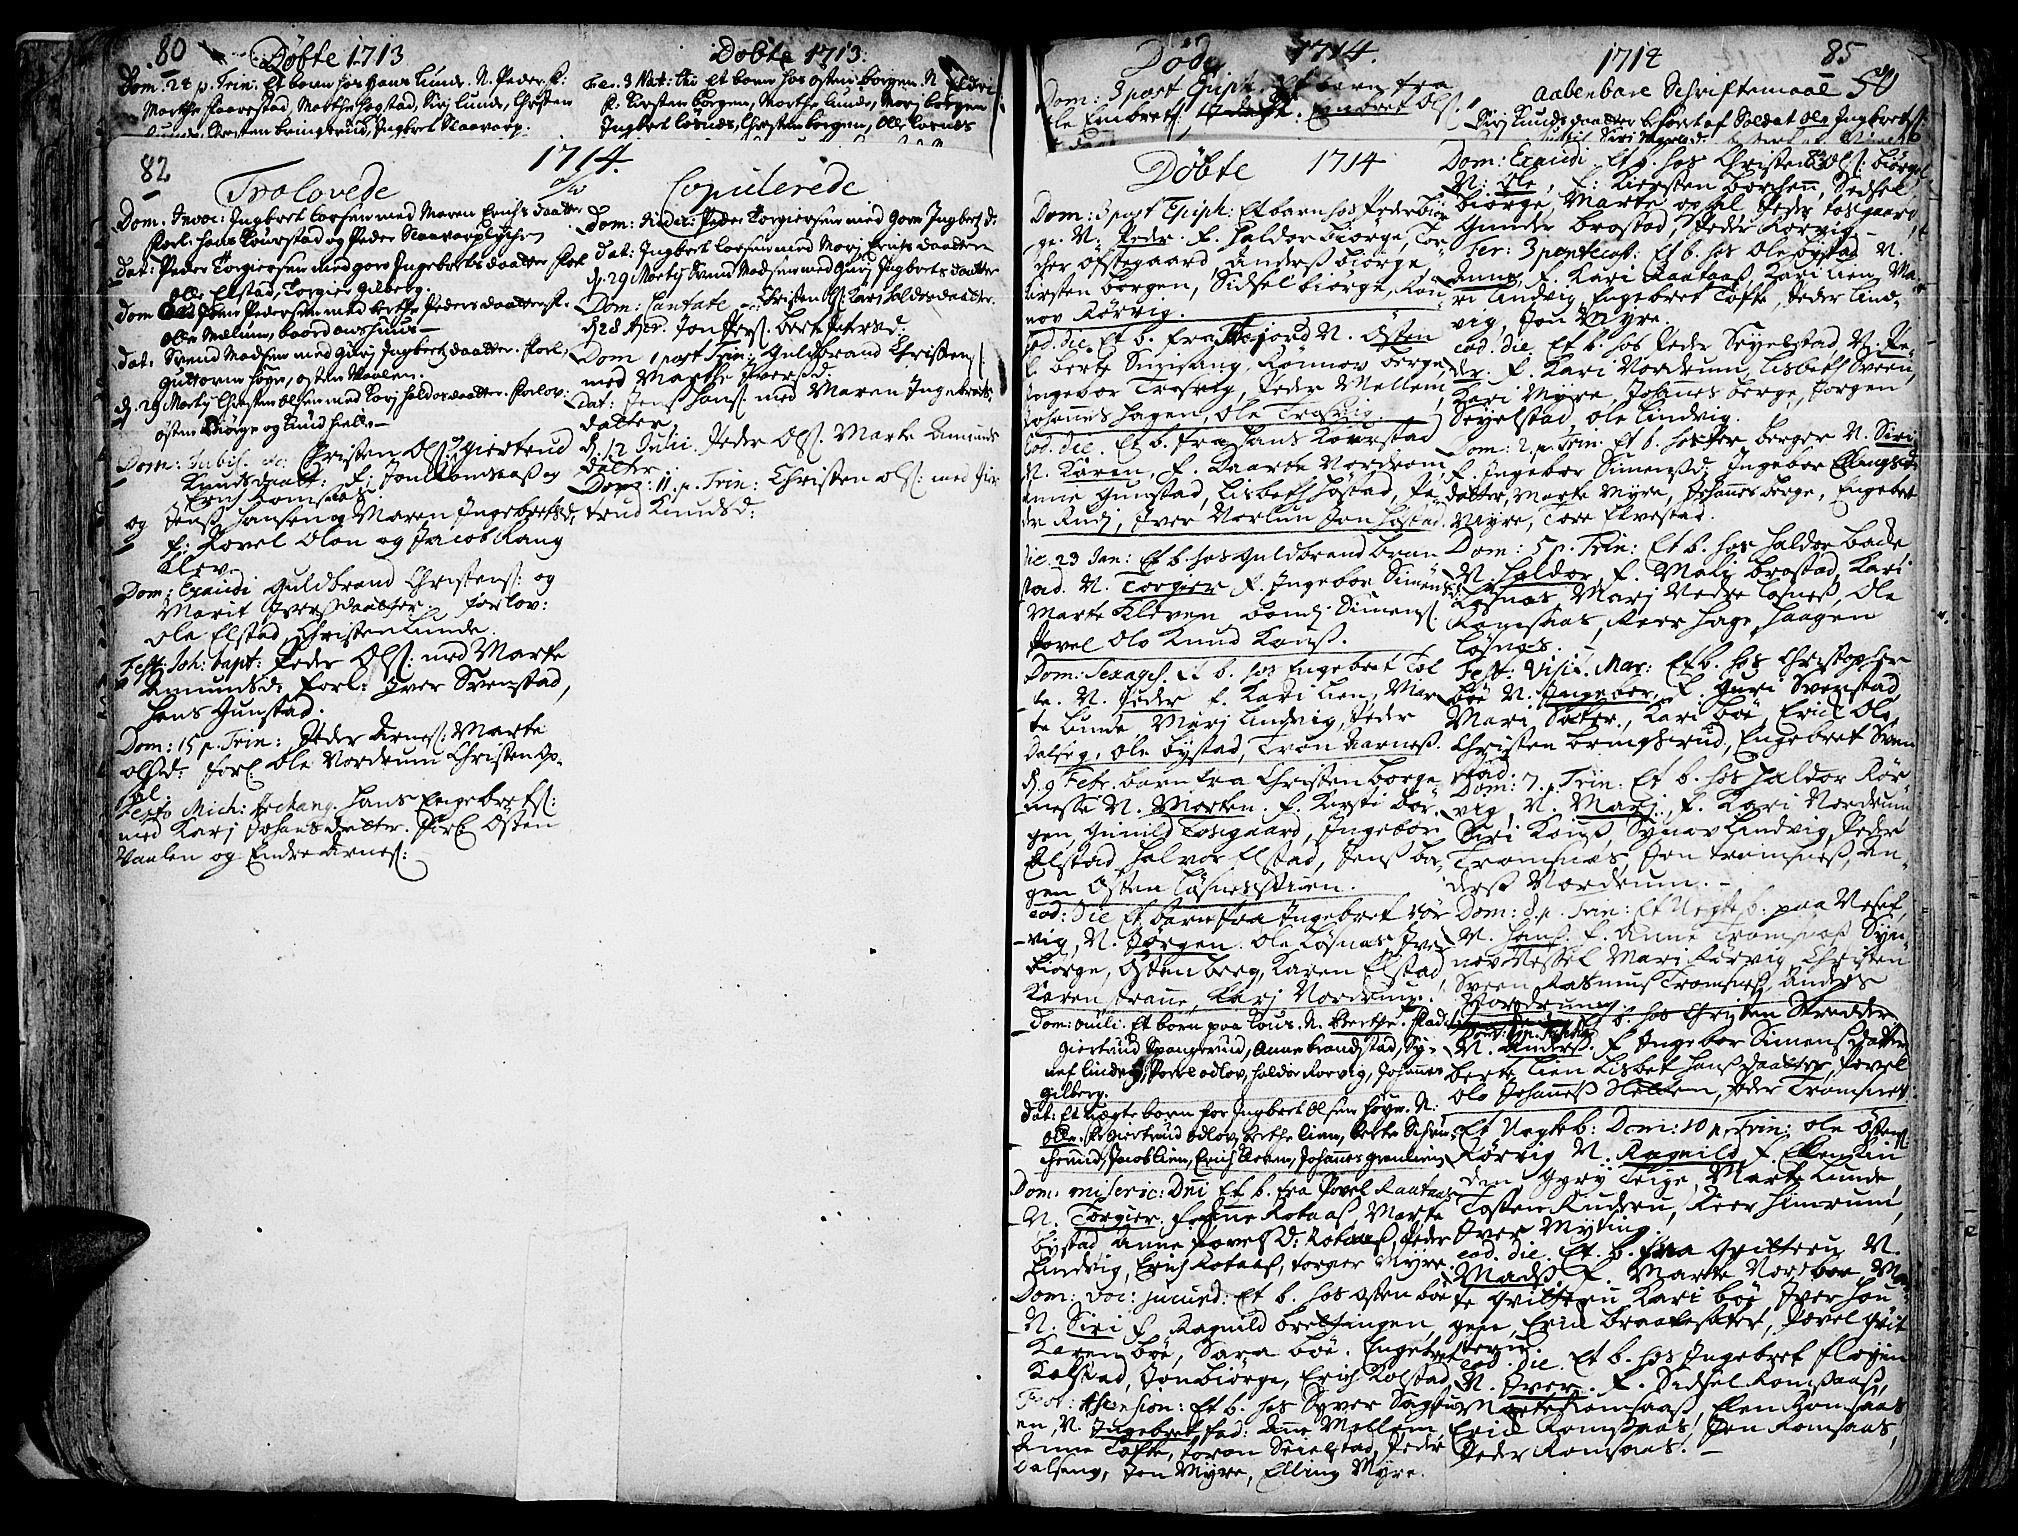 SAH, Ringebu prestekontor, Ministerialbok nr. 1, 1696-1733, s. 82-83